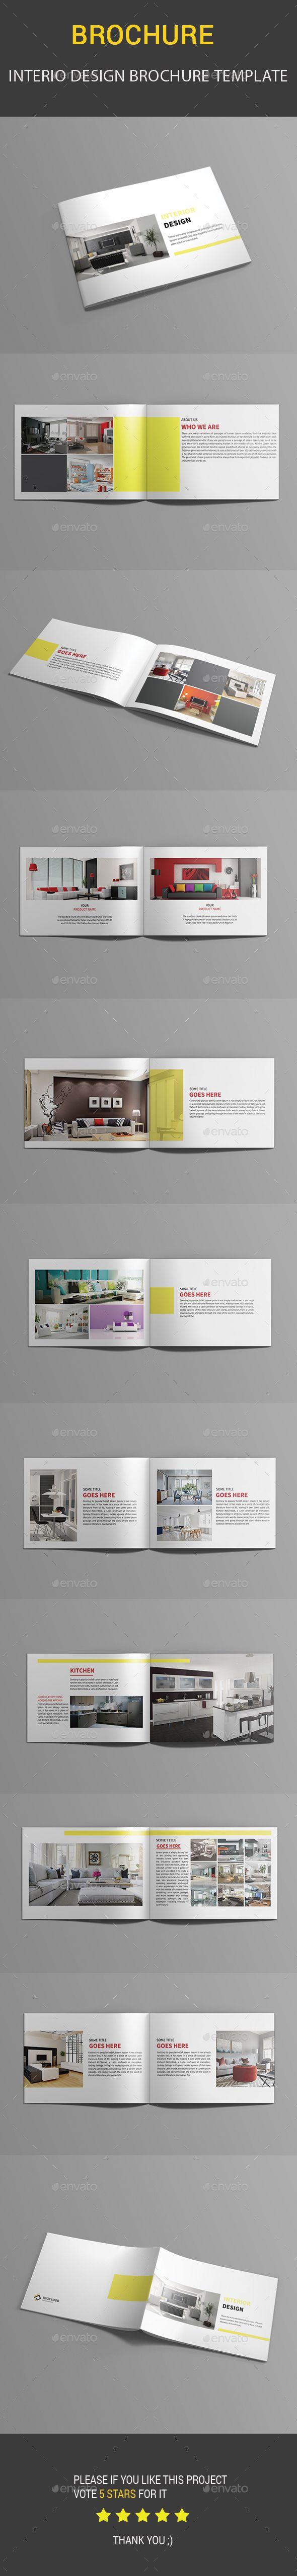 Interio Design Brochure Template InDesign INDD. Download here…